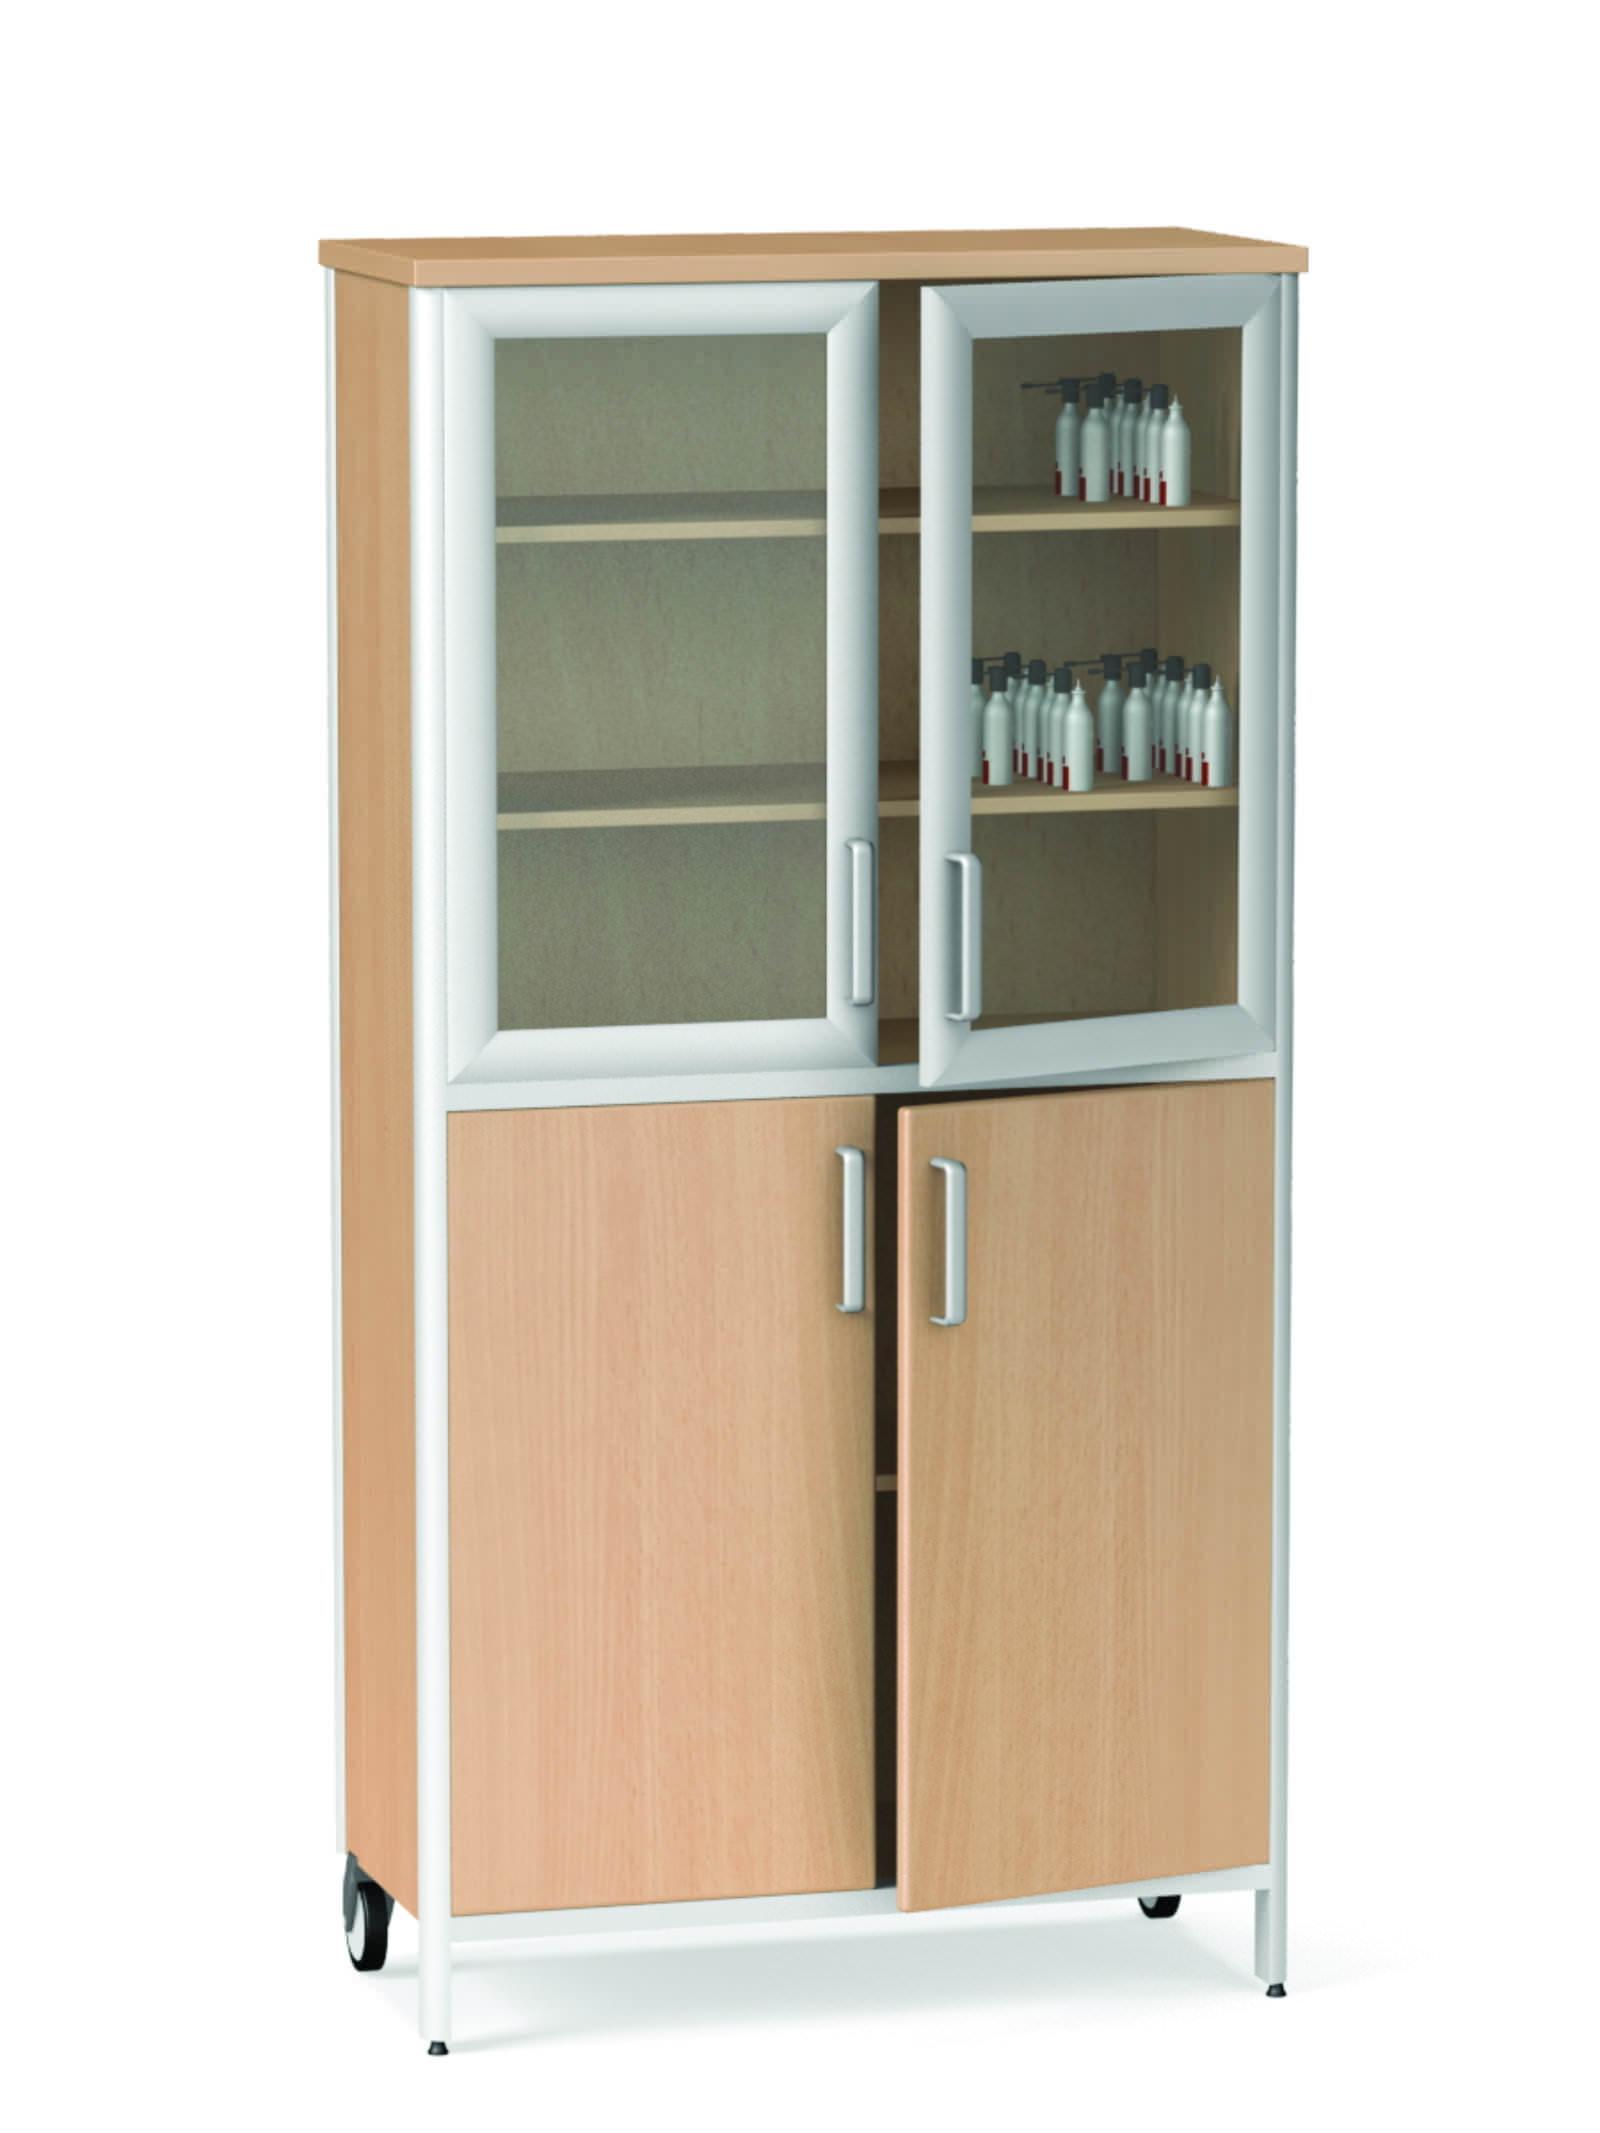 Медицинский шкаф ДМ-3-001-13